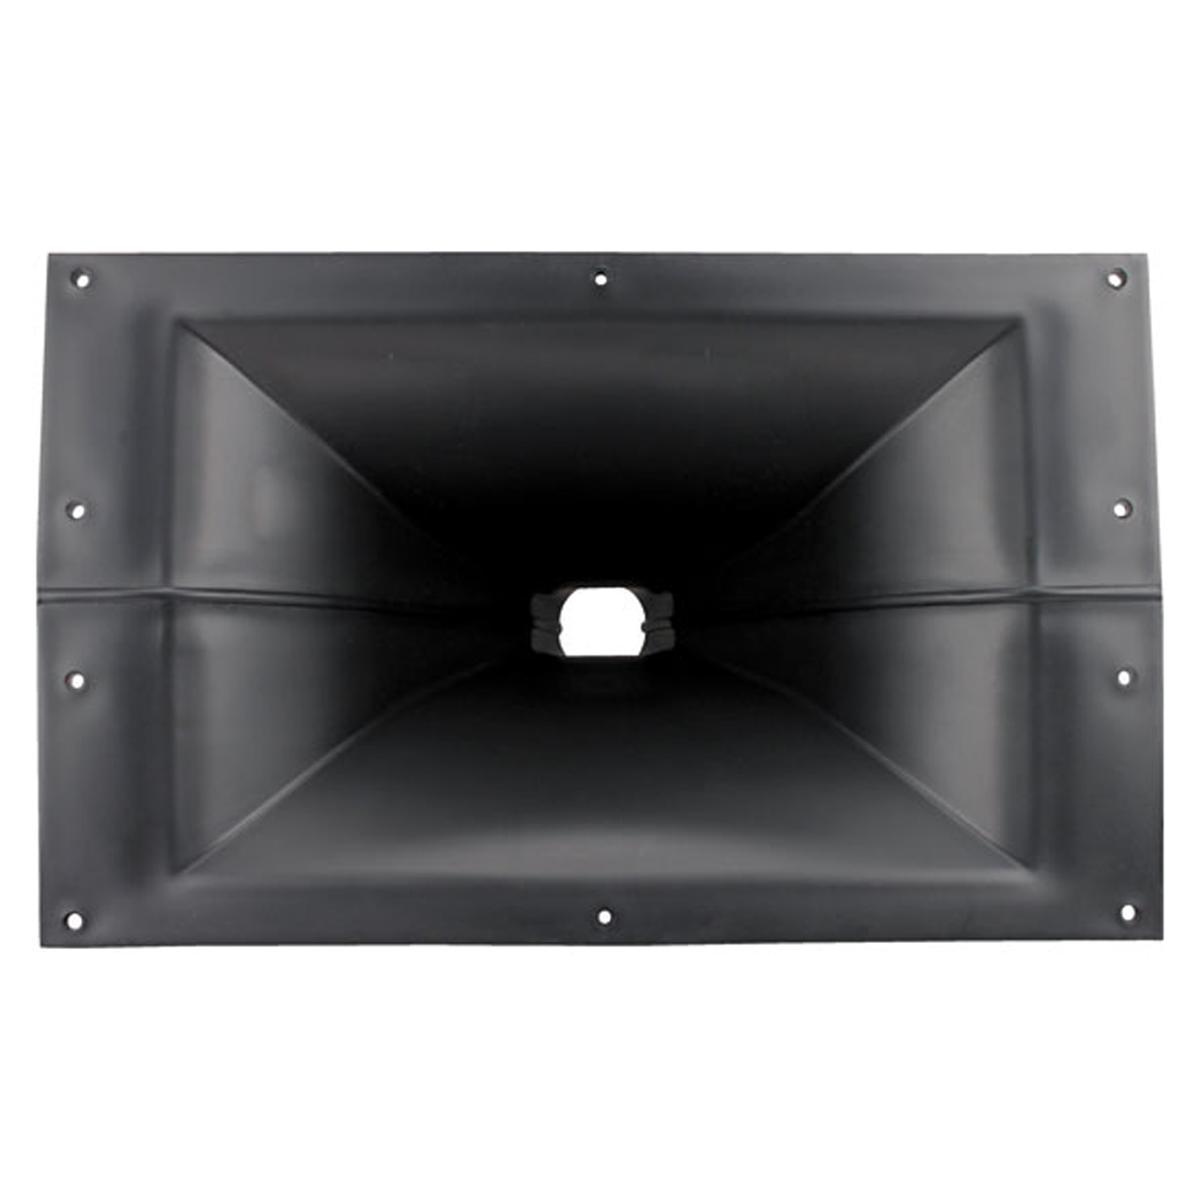 Corneta de plastico para driver 44 cm x 28 cm x 22,5 cm LC03 JBL2385 Flange Ludovico 16064